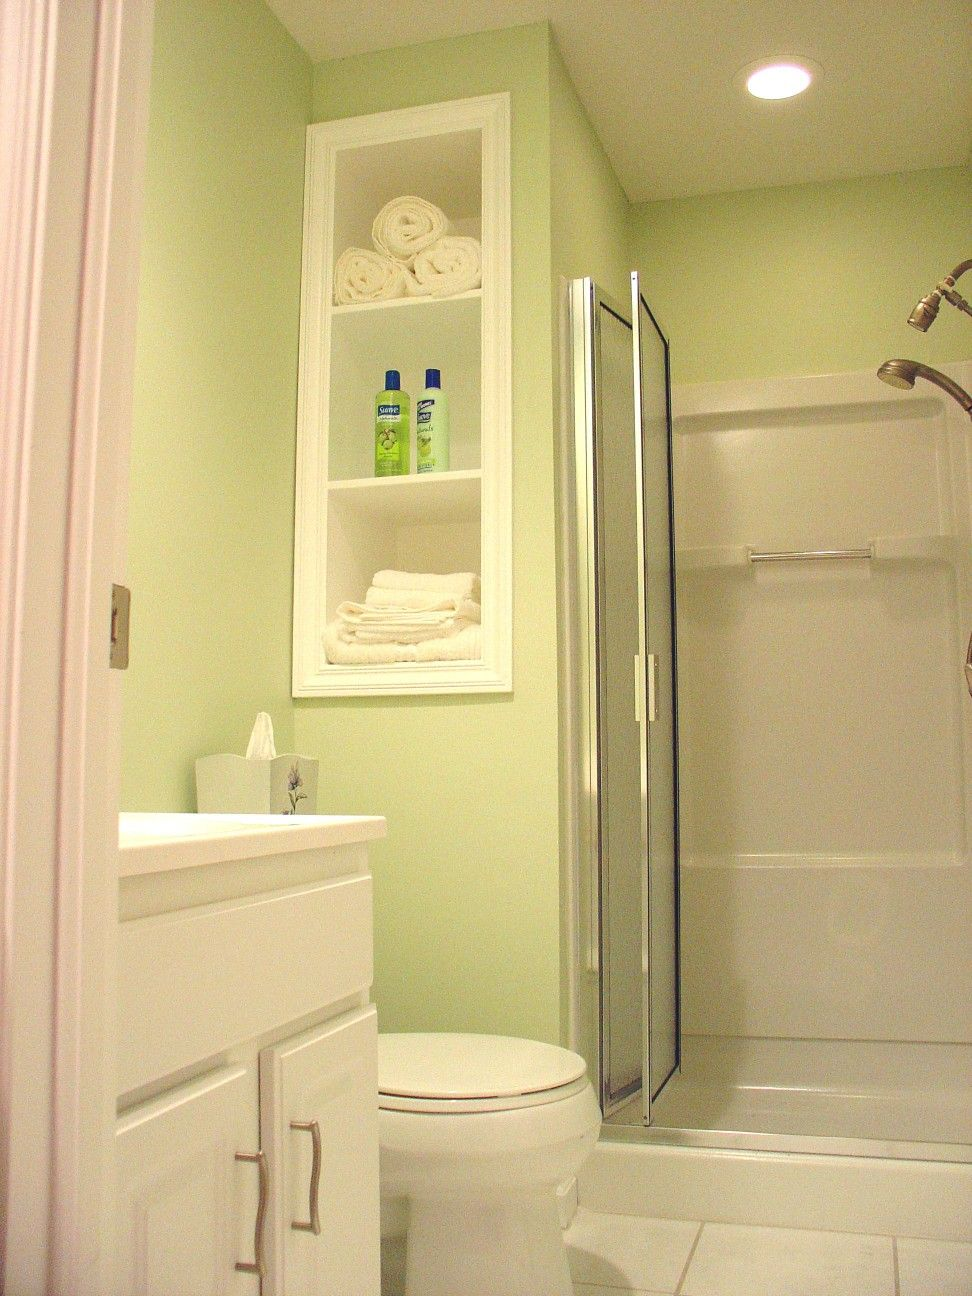 Bathroom Interior Design For Small Spaces Ideas 2017 2018